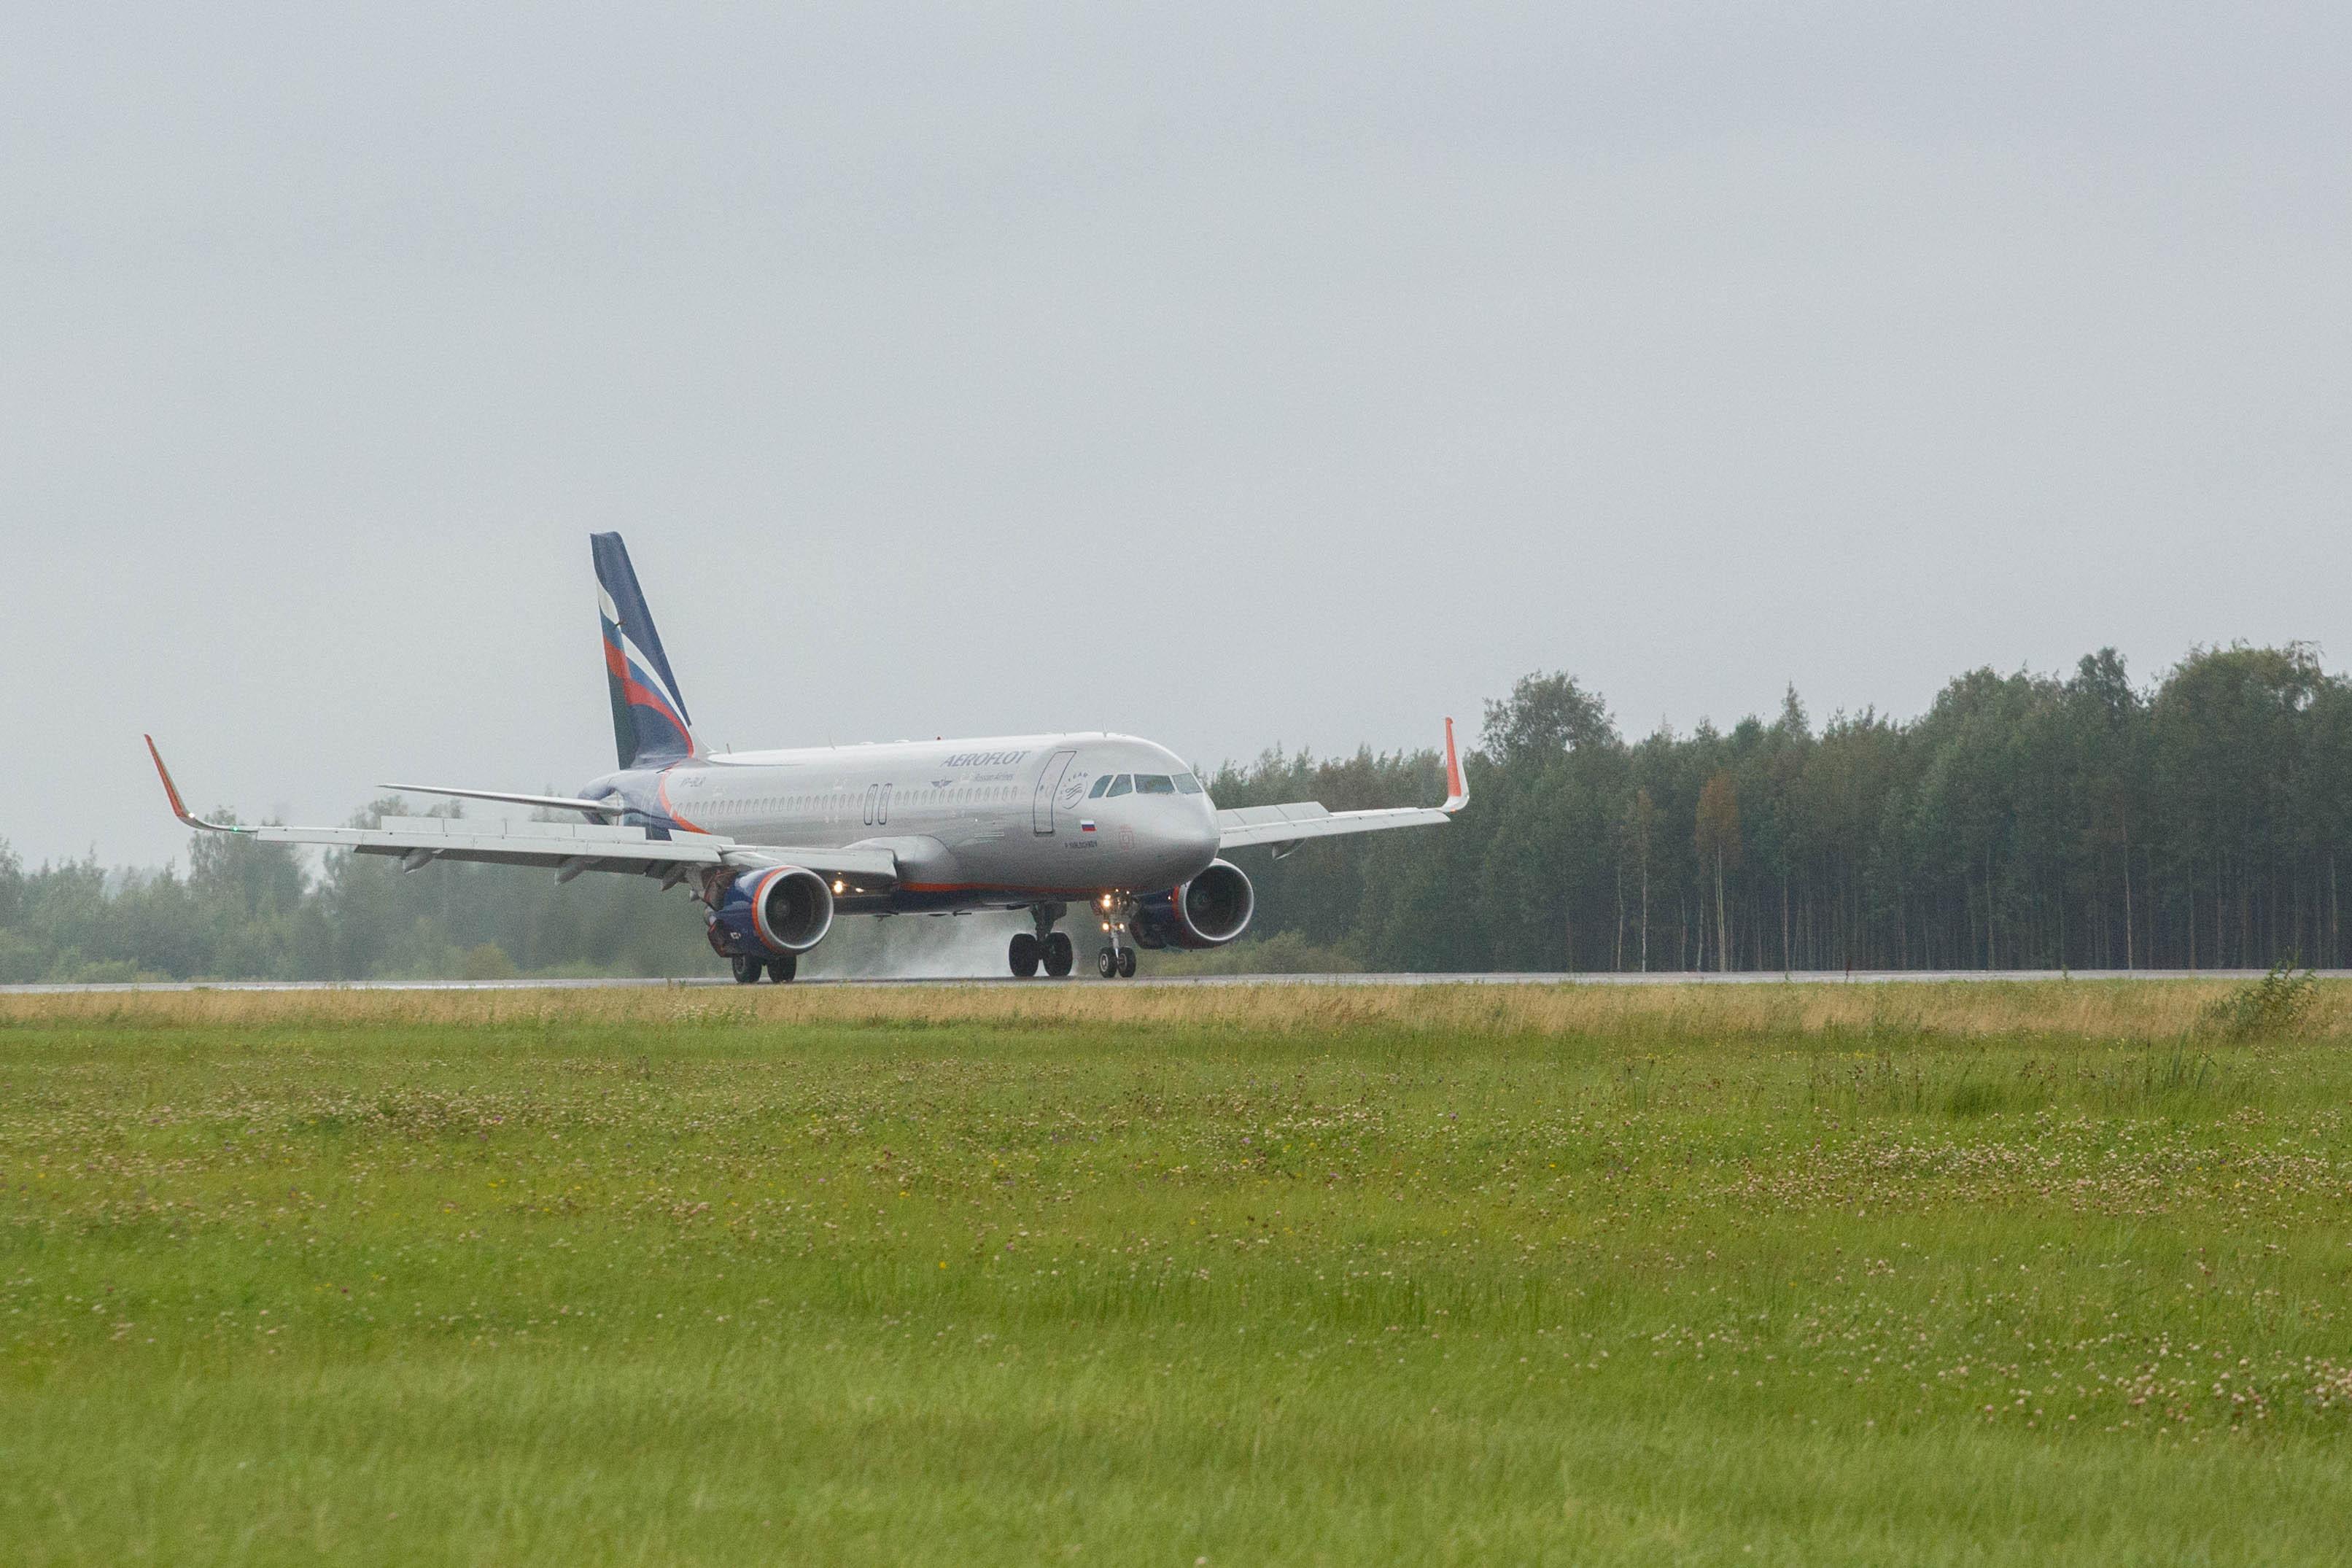 Министр здравоохраненияРФ спасла жизнь пассажира наборту самолета